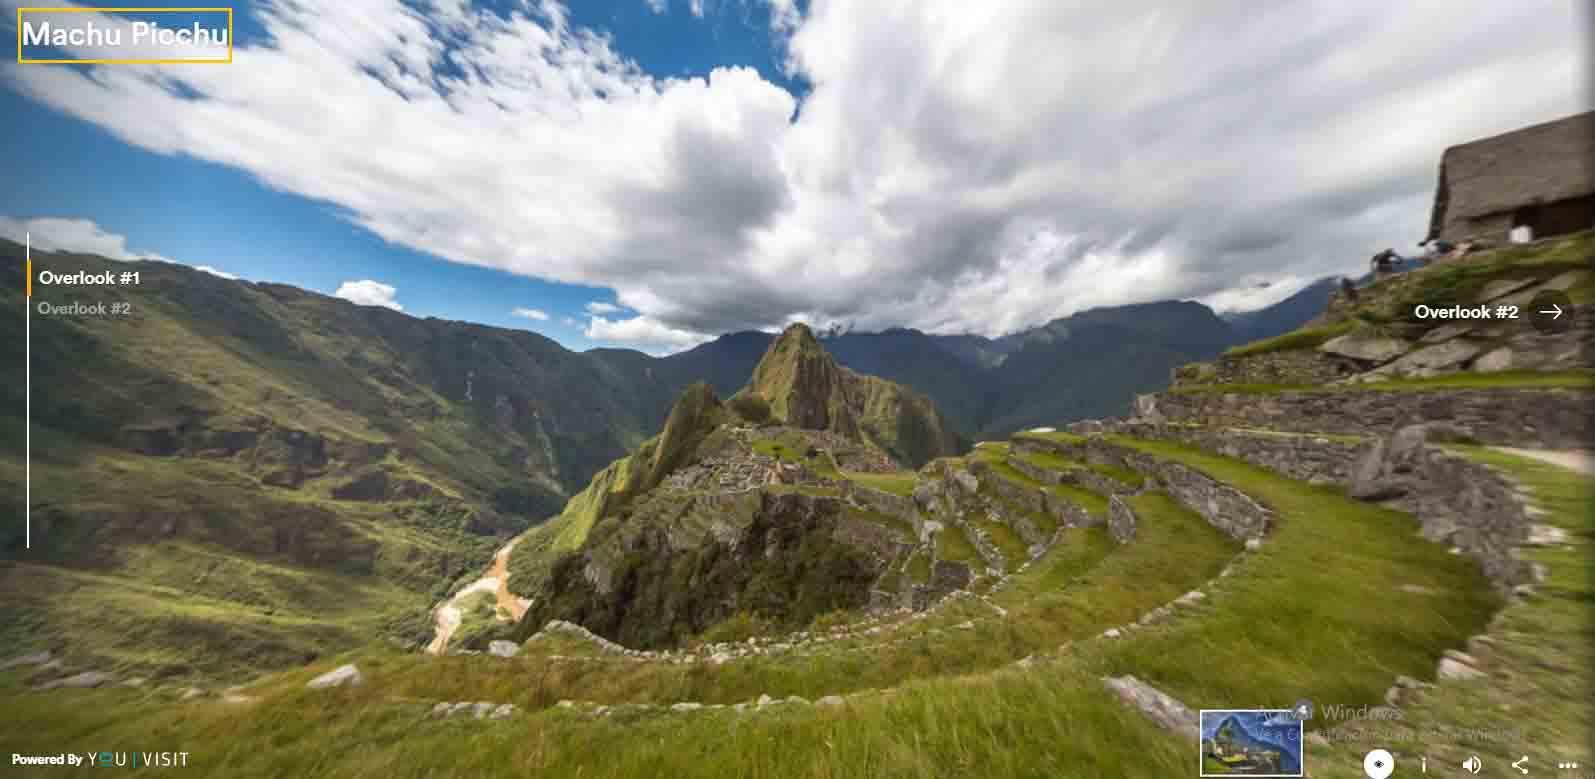 Virtual Tours of Machu Picchu